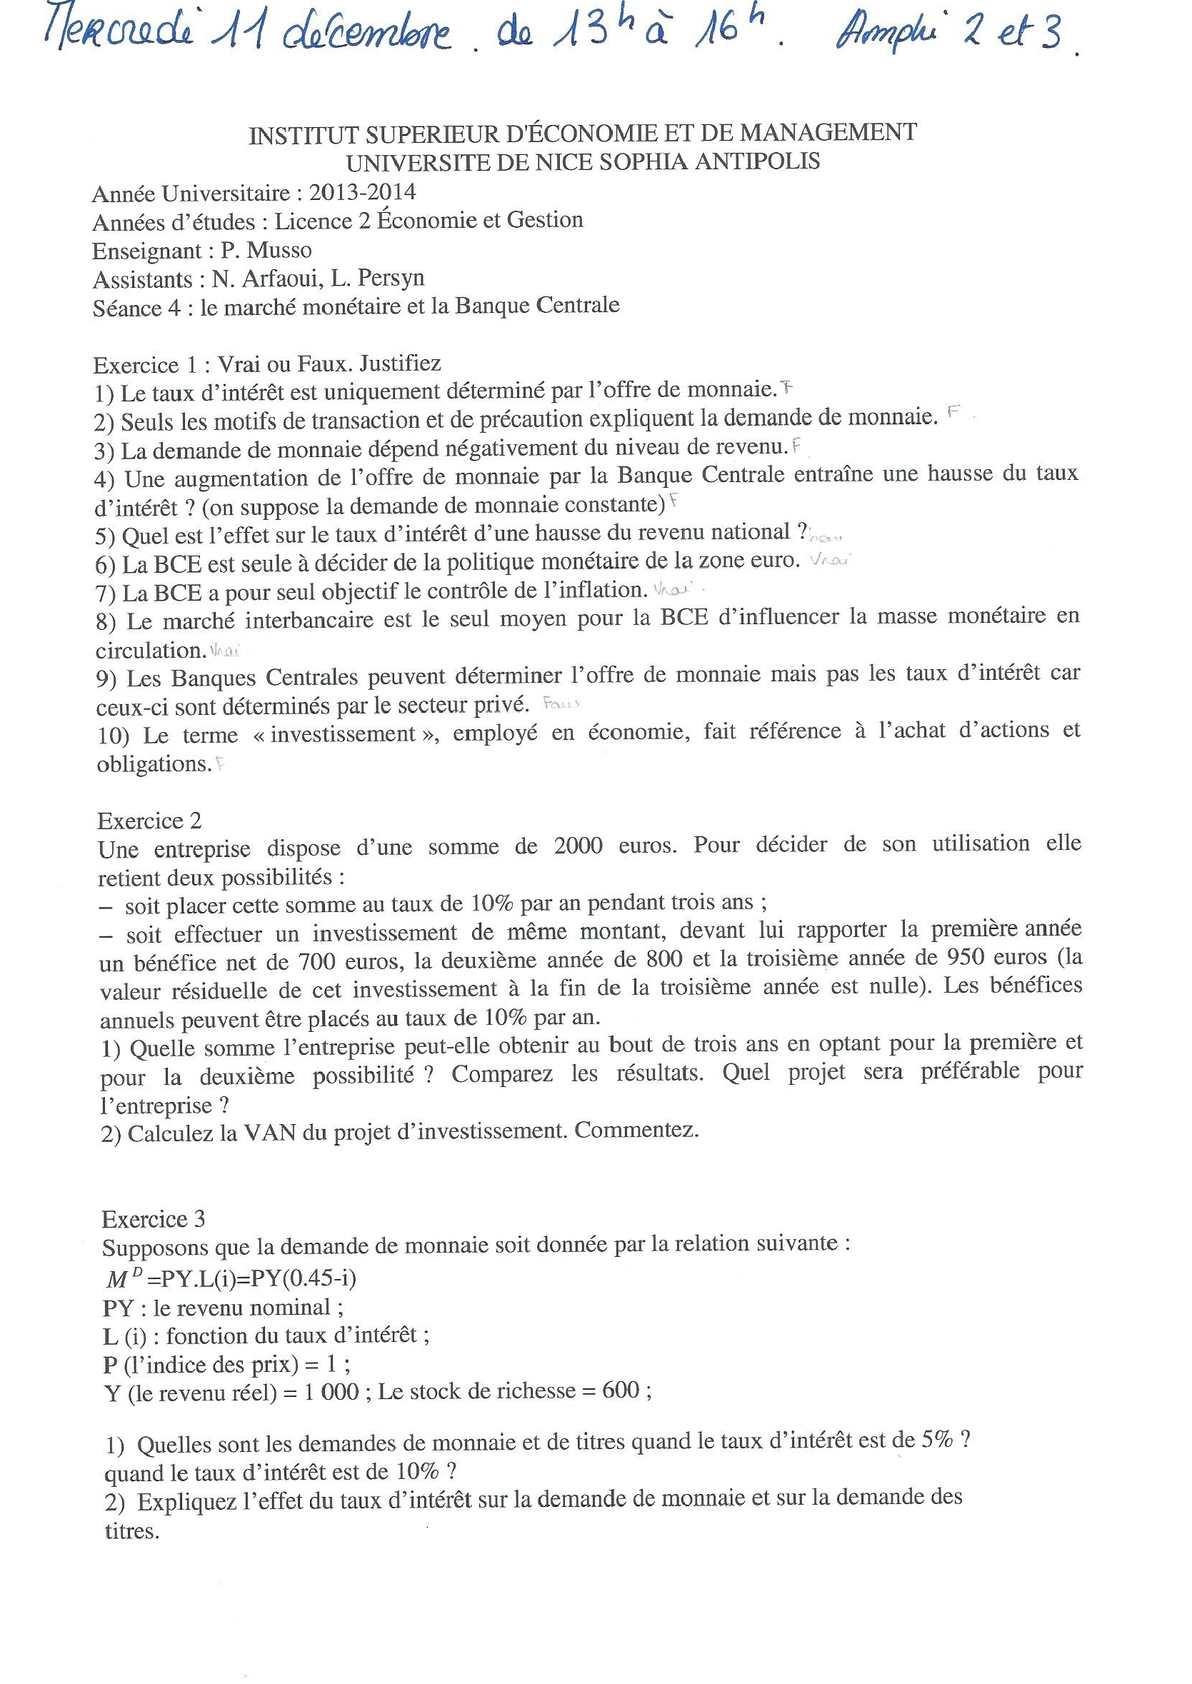 td macroéconomie_ correction séance 4